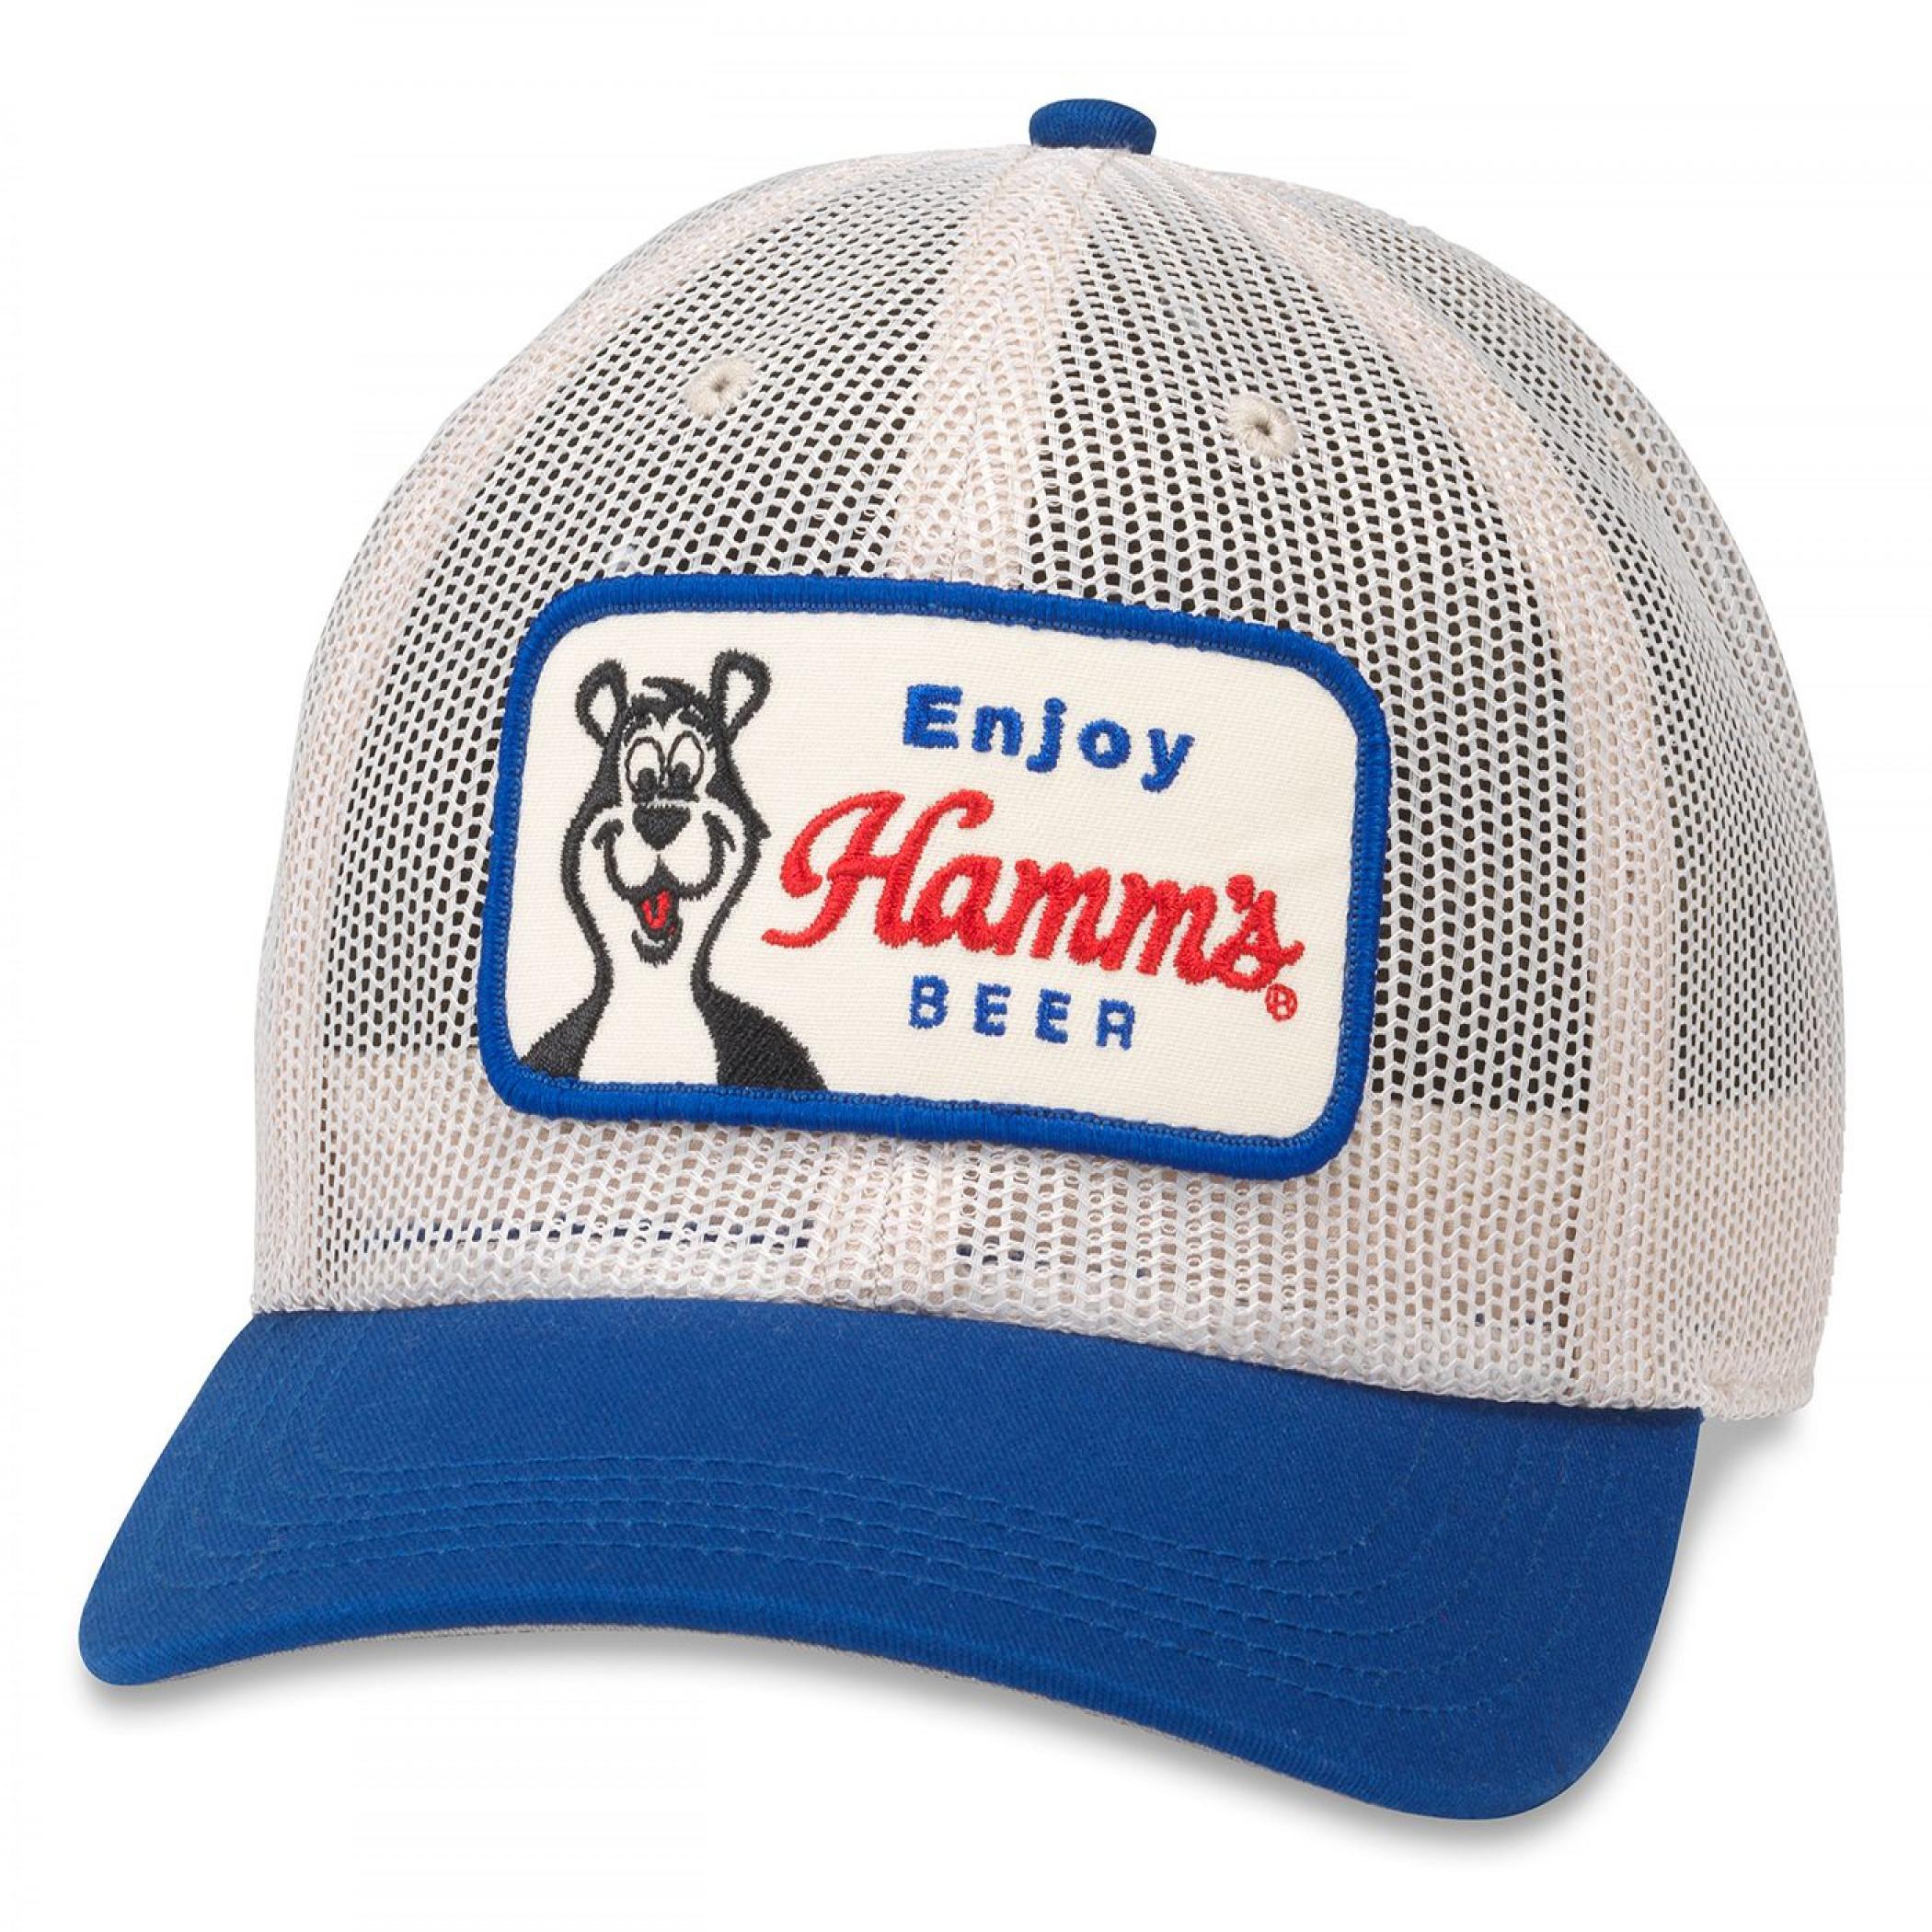 Hamm's Beer Enjoy Tucker Style Hat